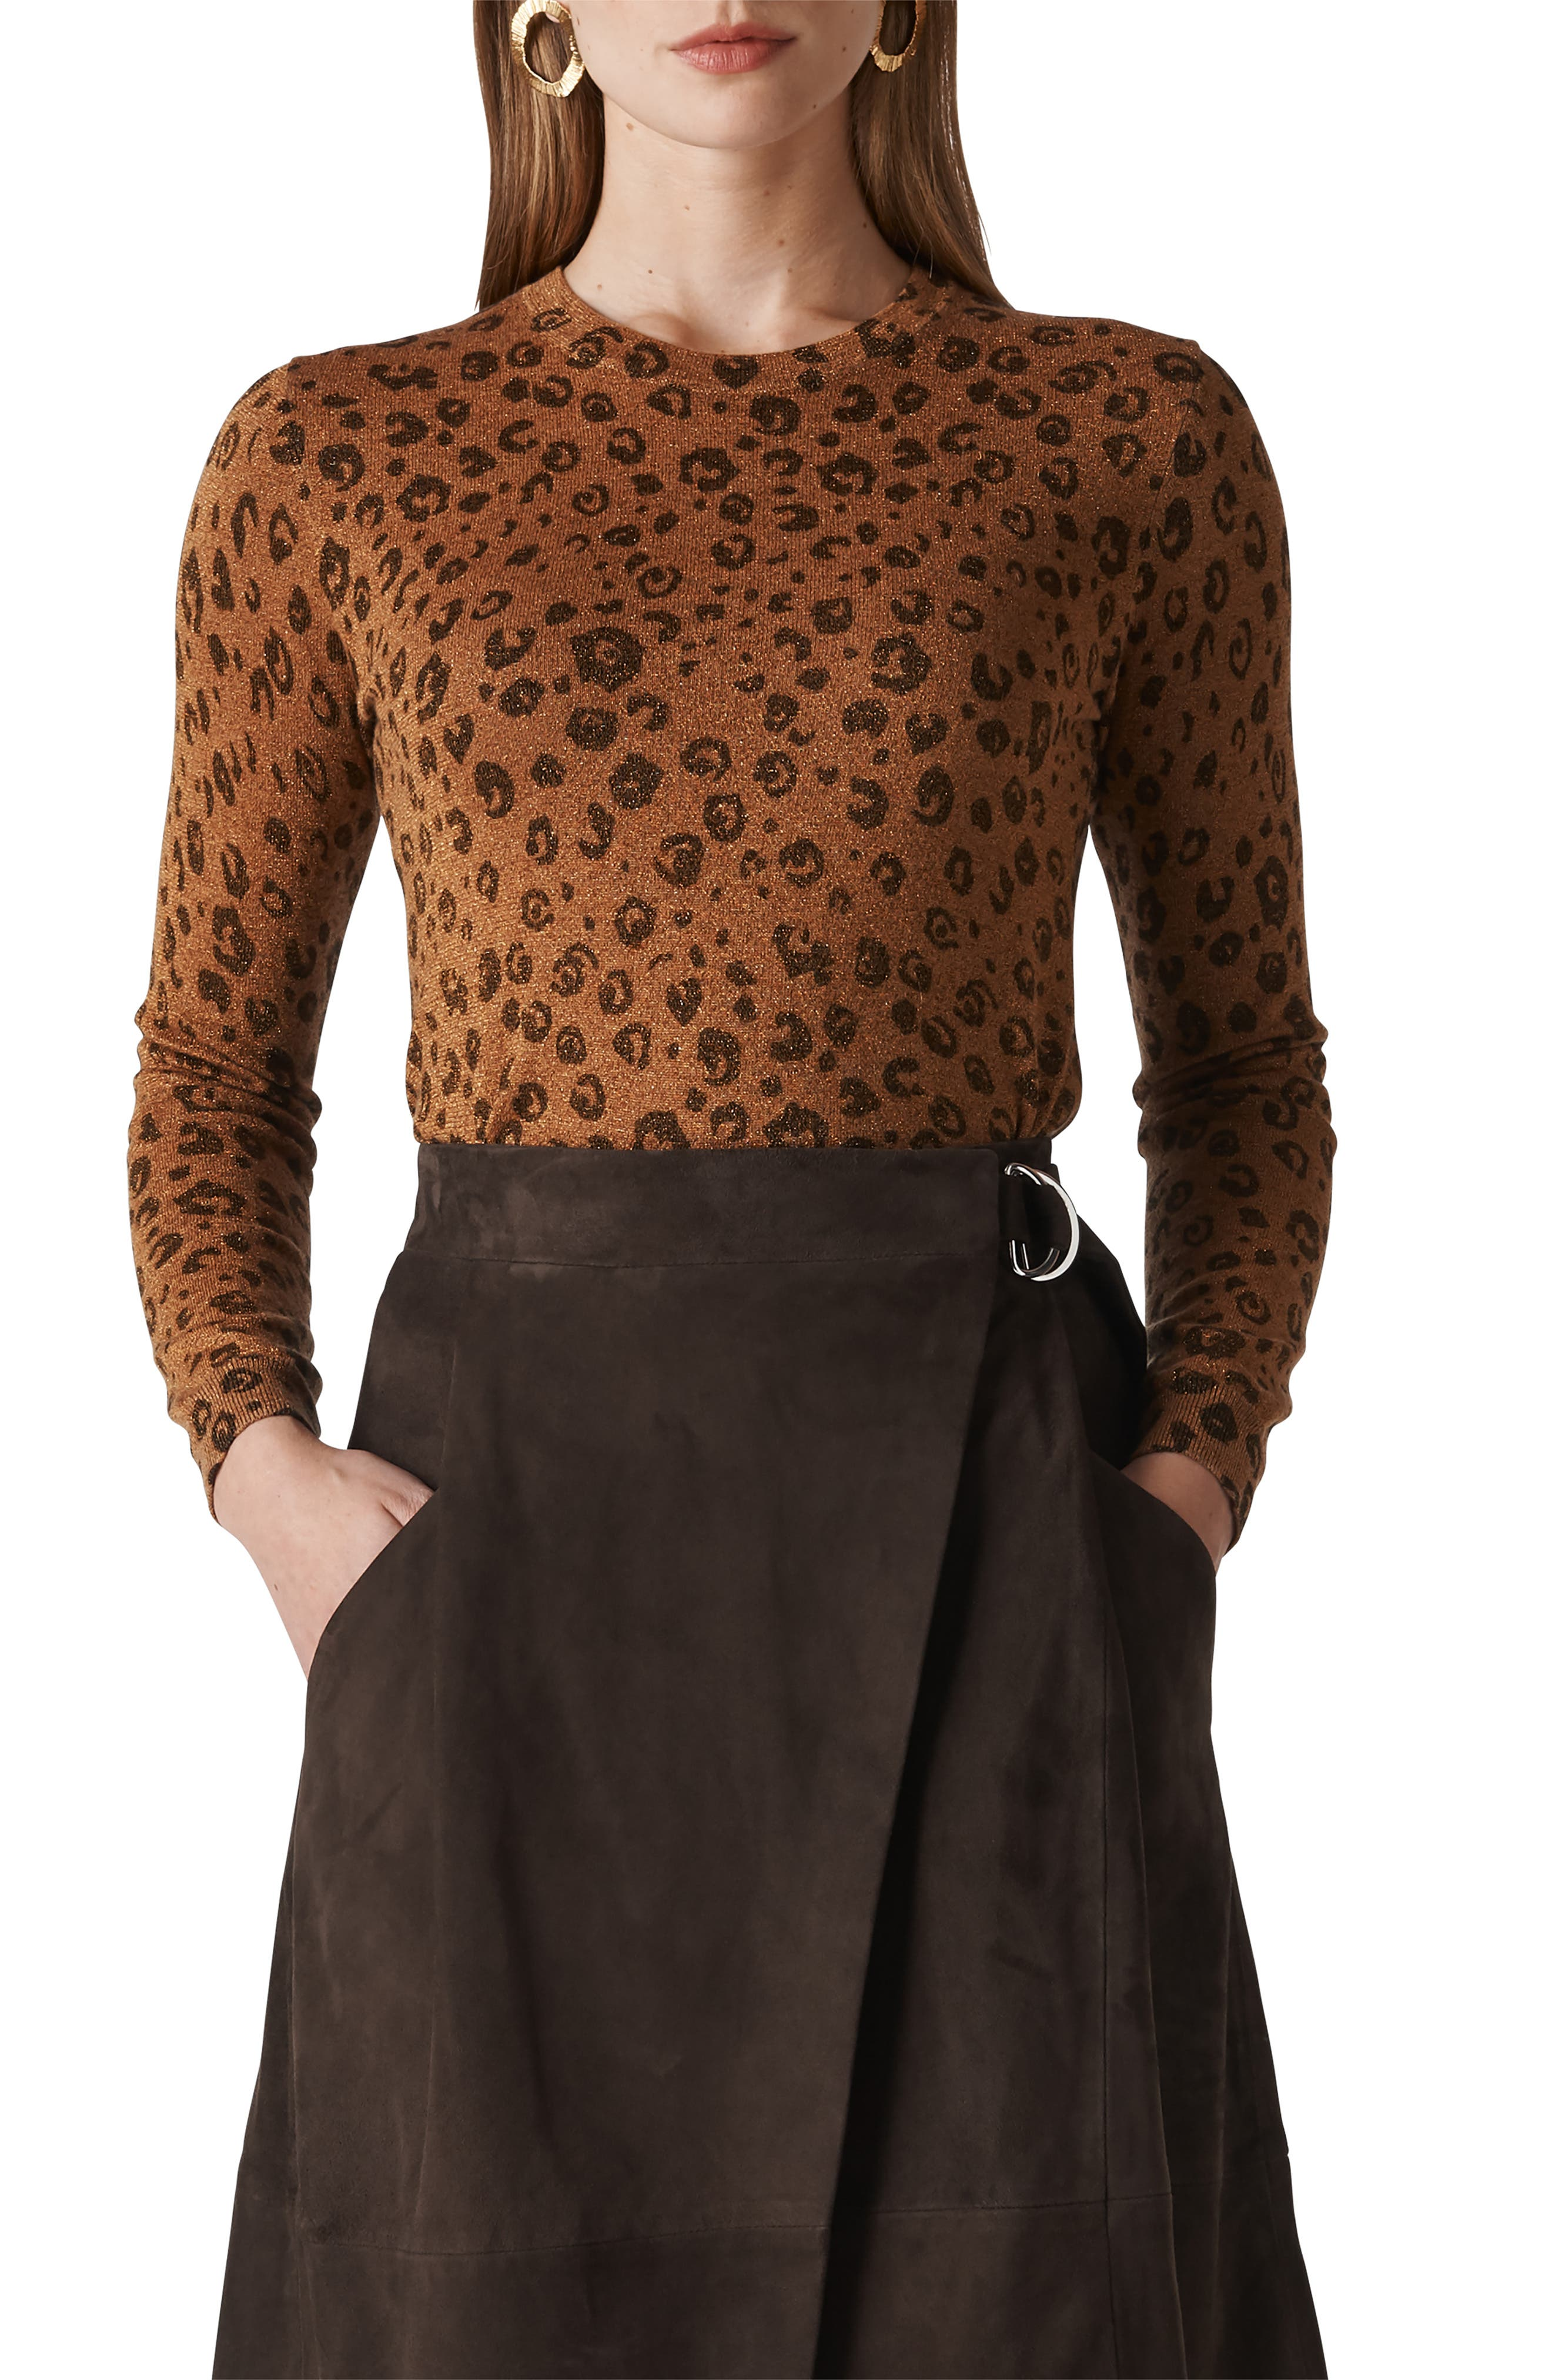 Cheetah Sparkle Sweater,                             Main thumbnail 1, color,                             MULTICOLOUR